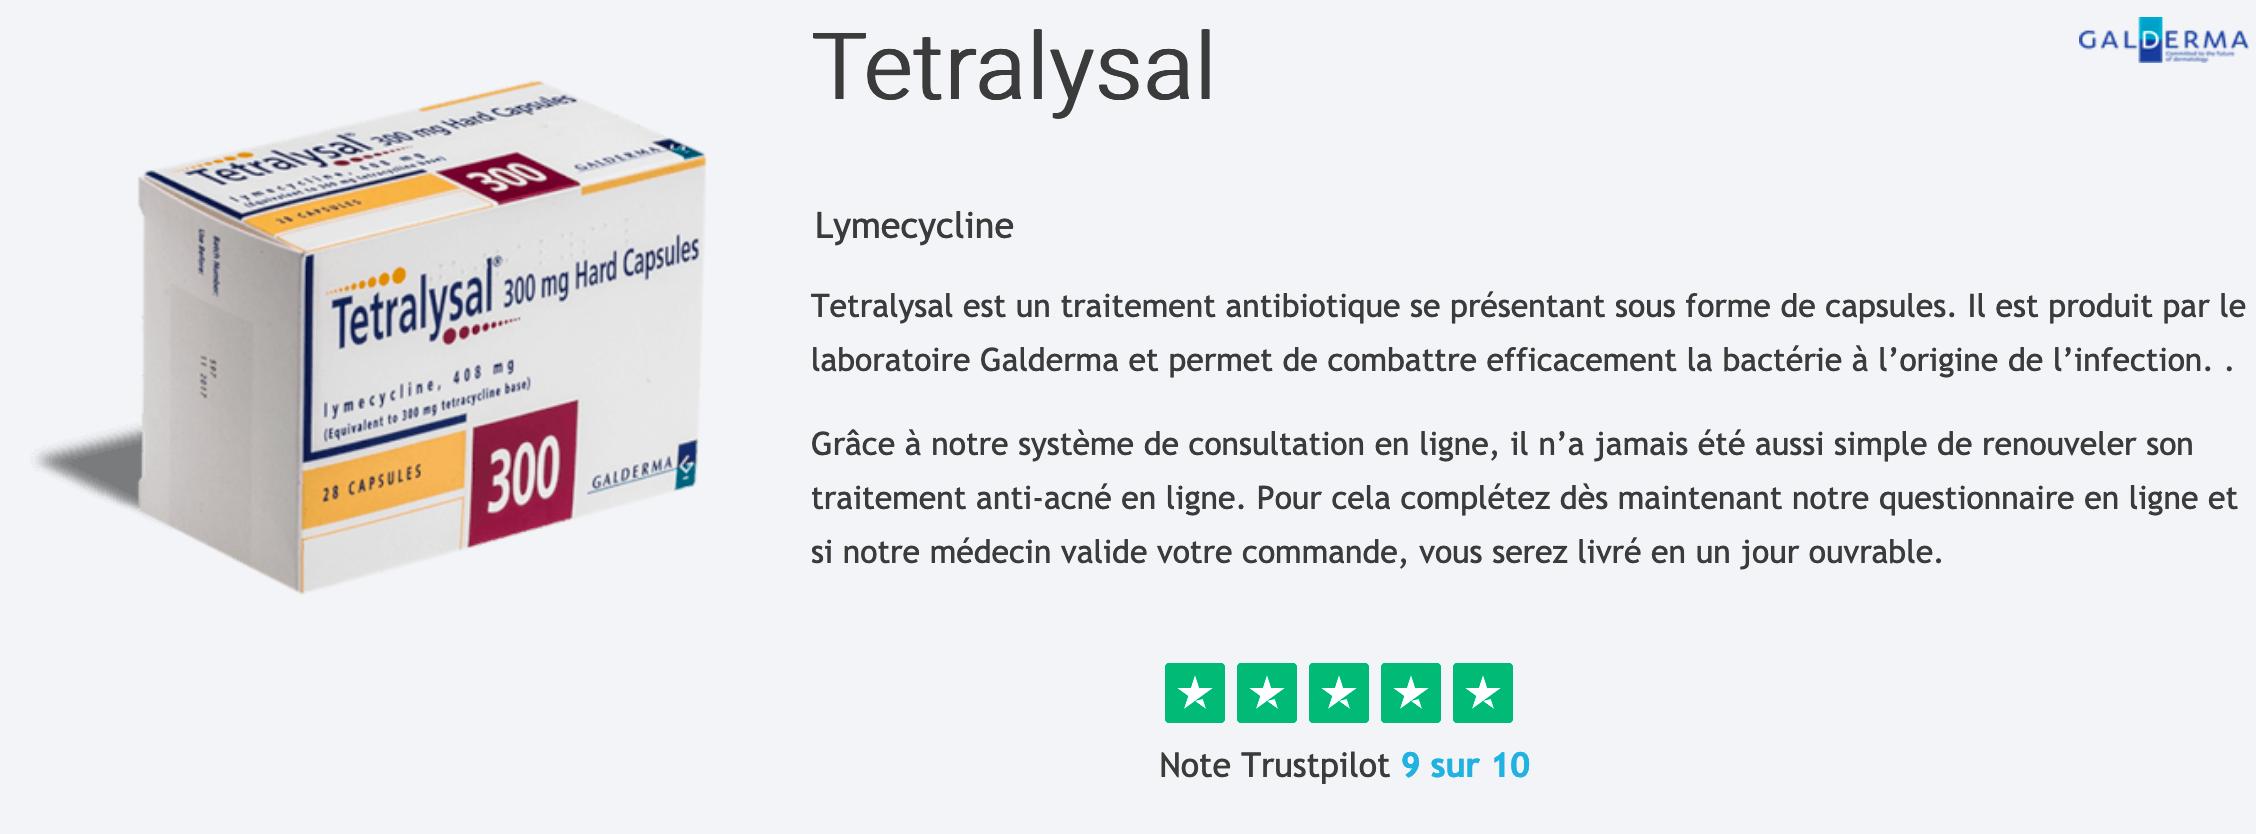 Tretralysal